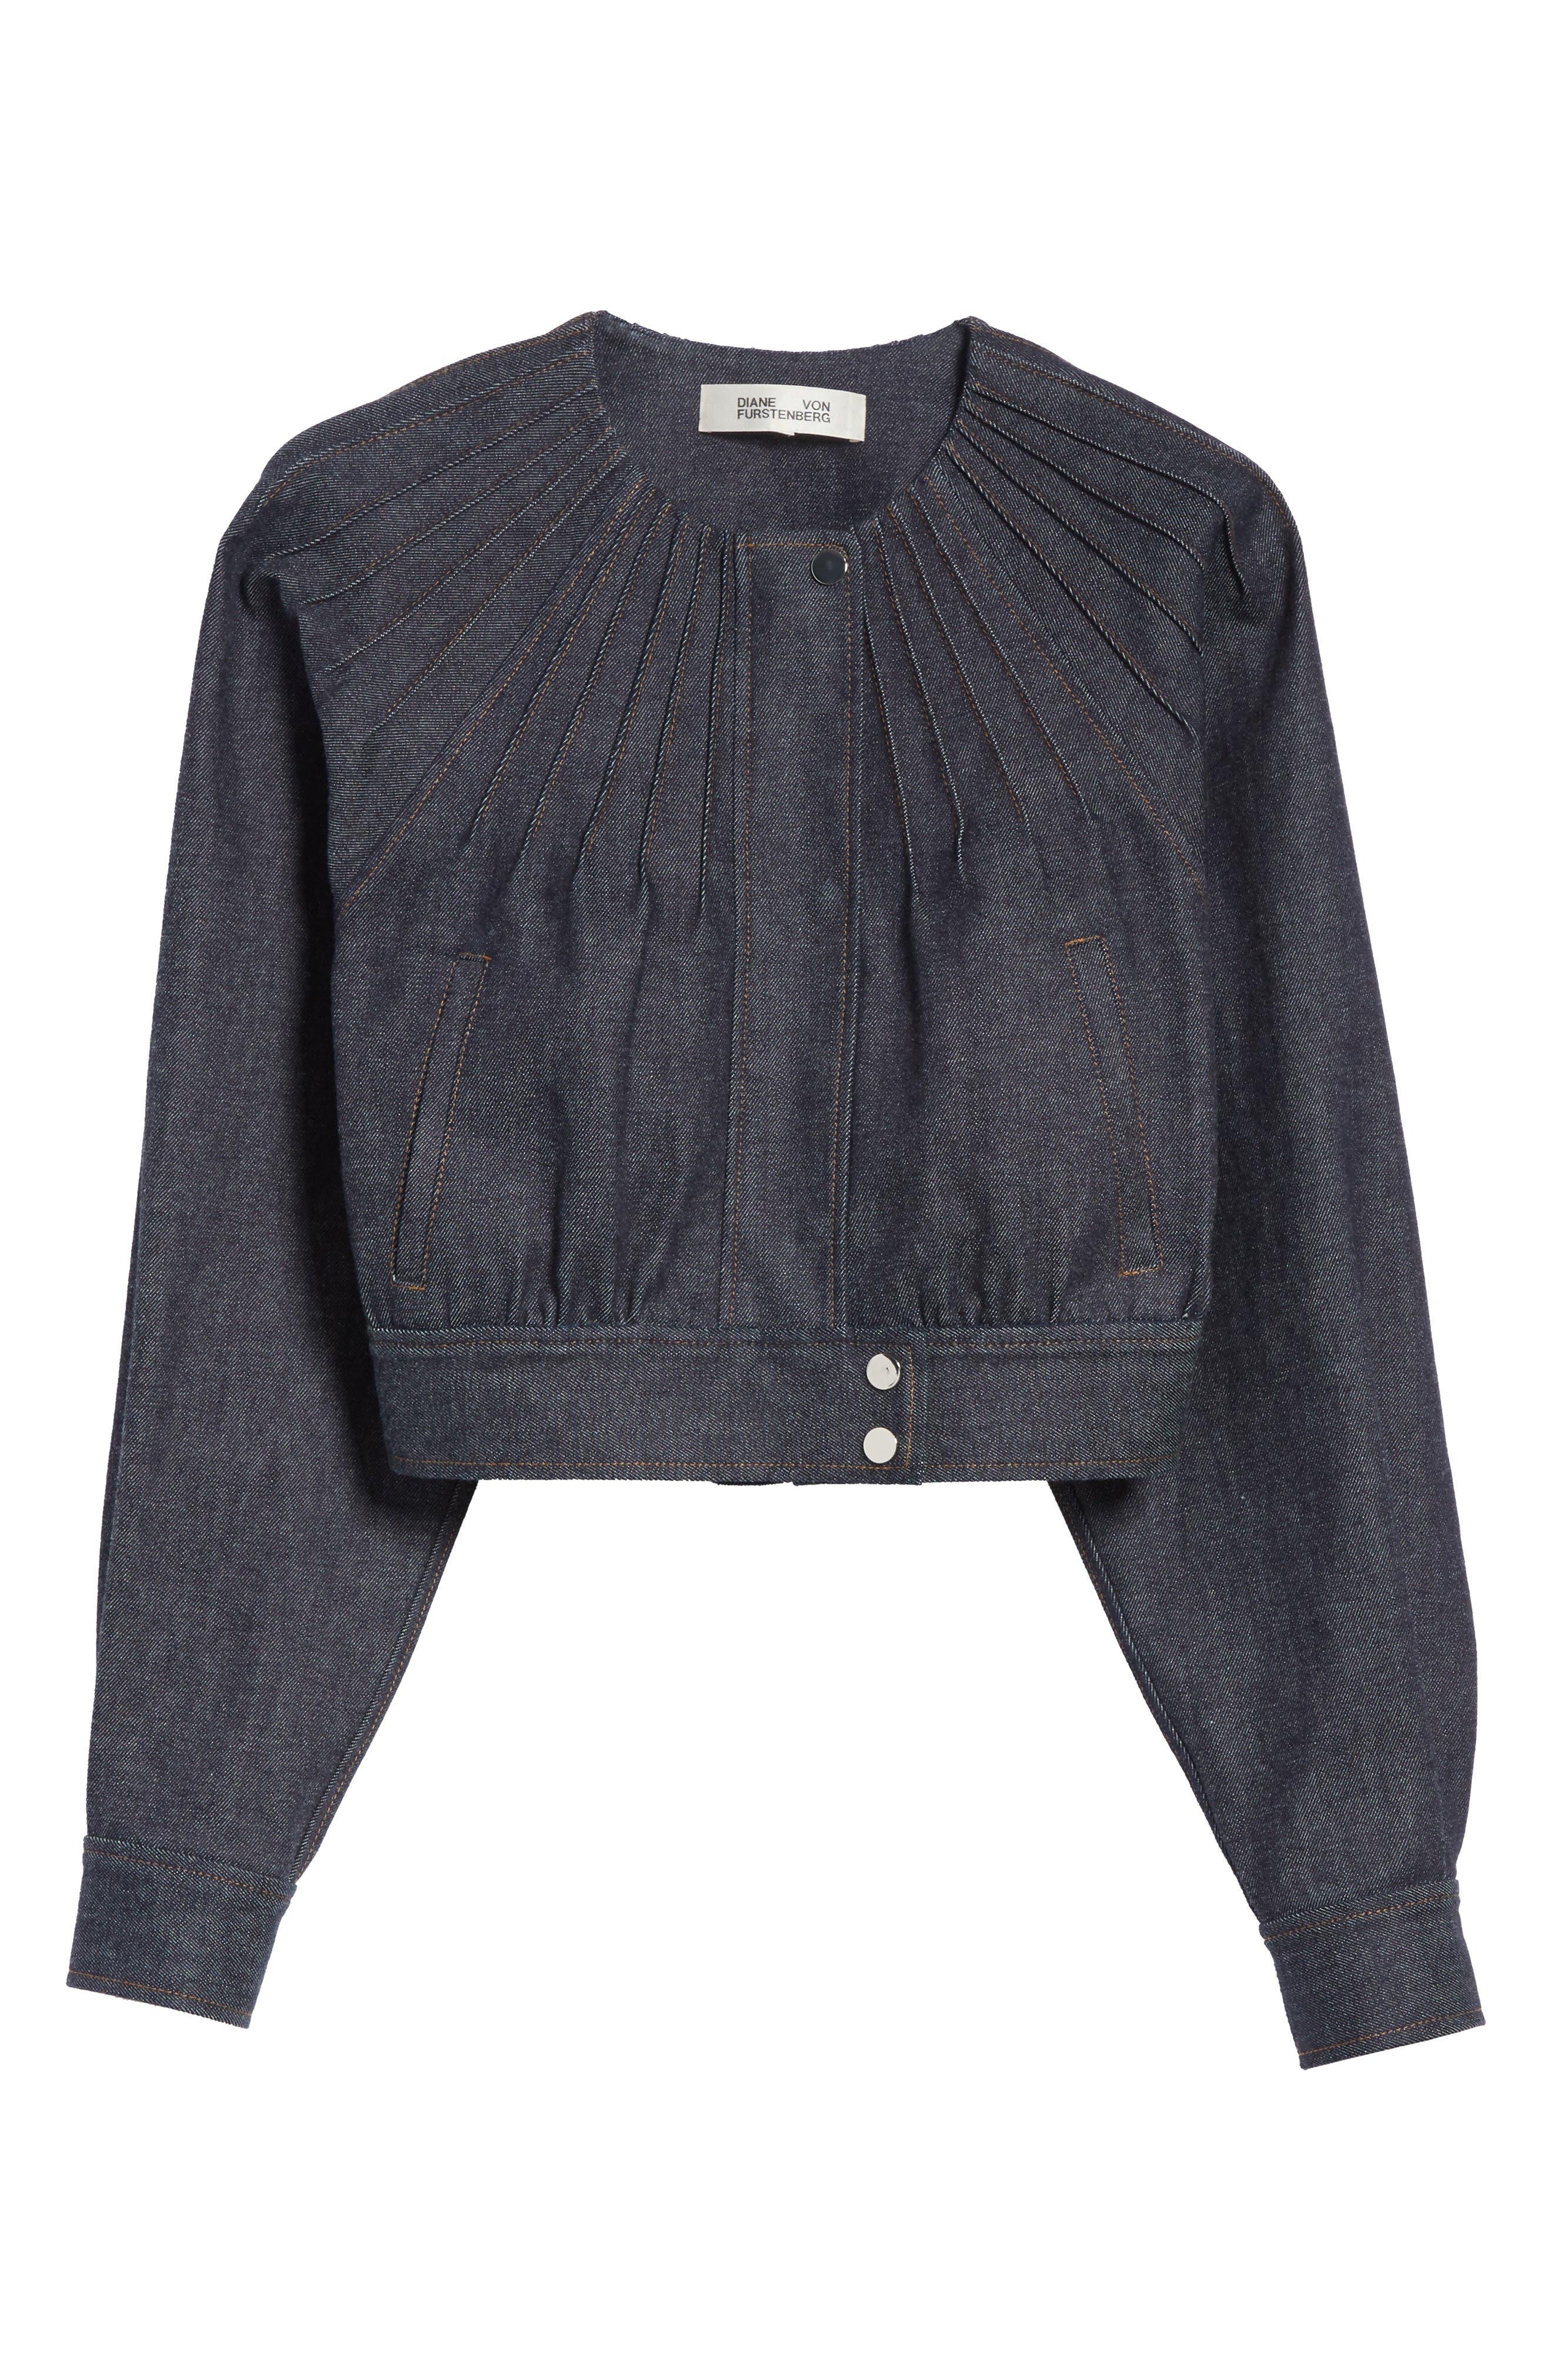 Diane von Furstenberg Pintuck Denim Jacket,                             Alternate thumbnail 5, color,                             400